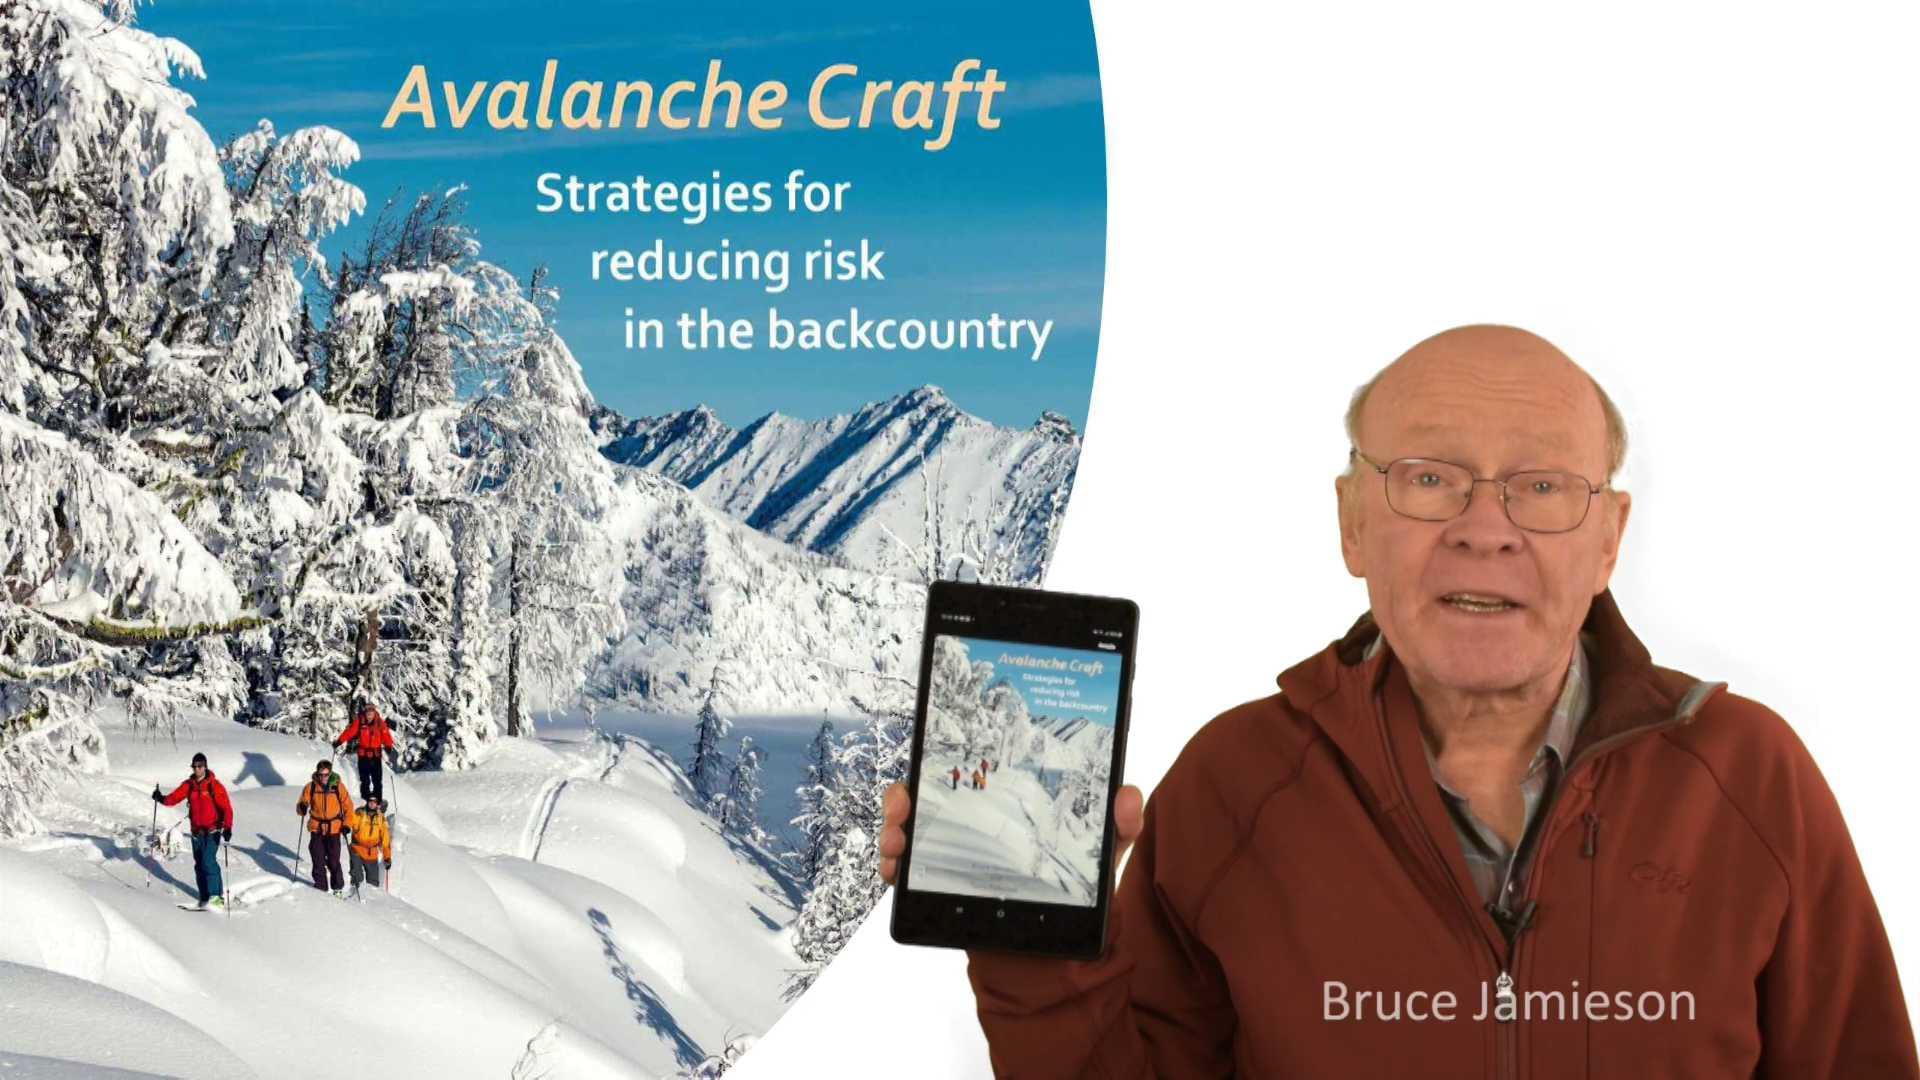 Avalanche Craft - the ebook